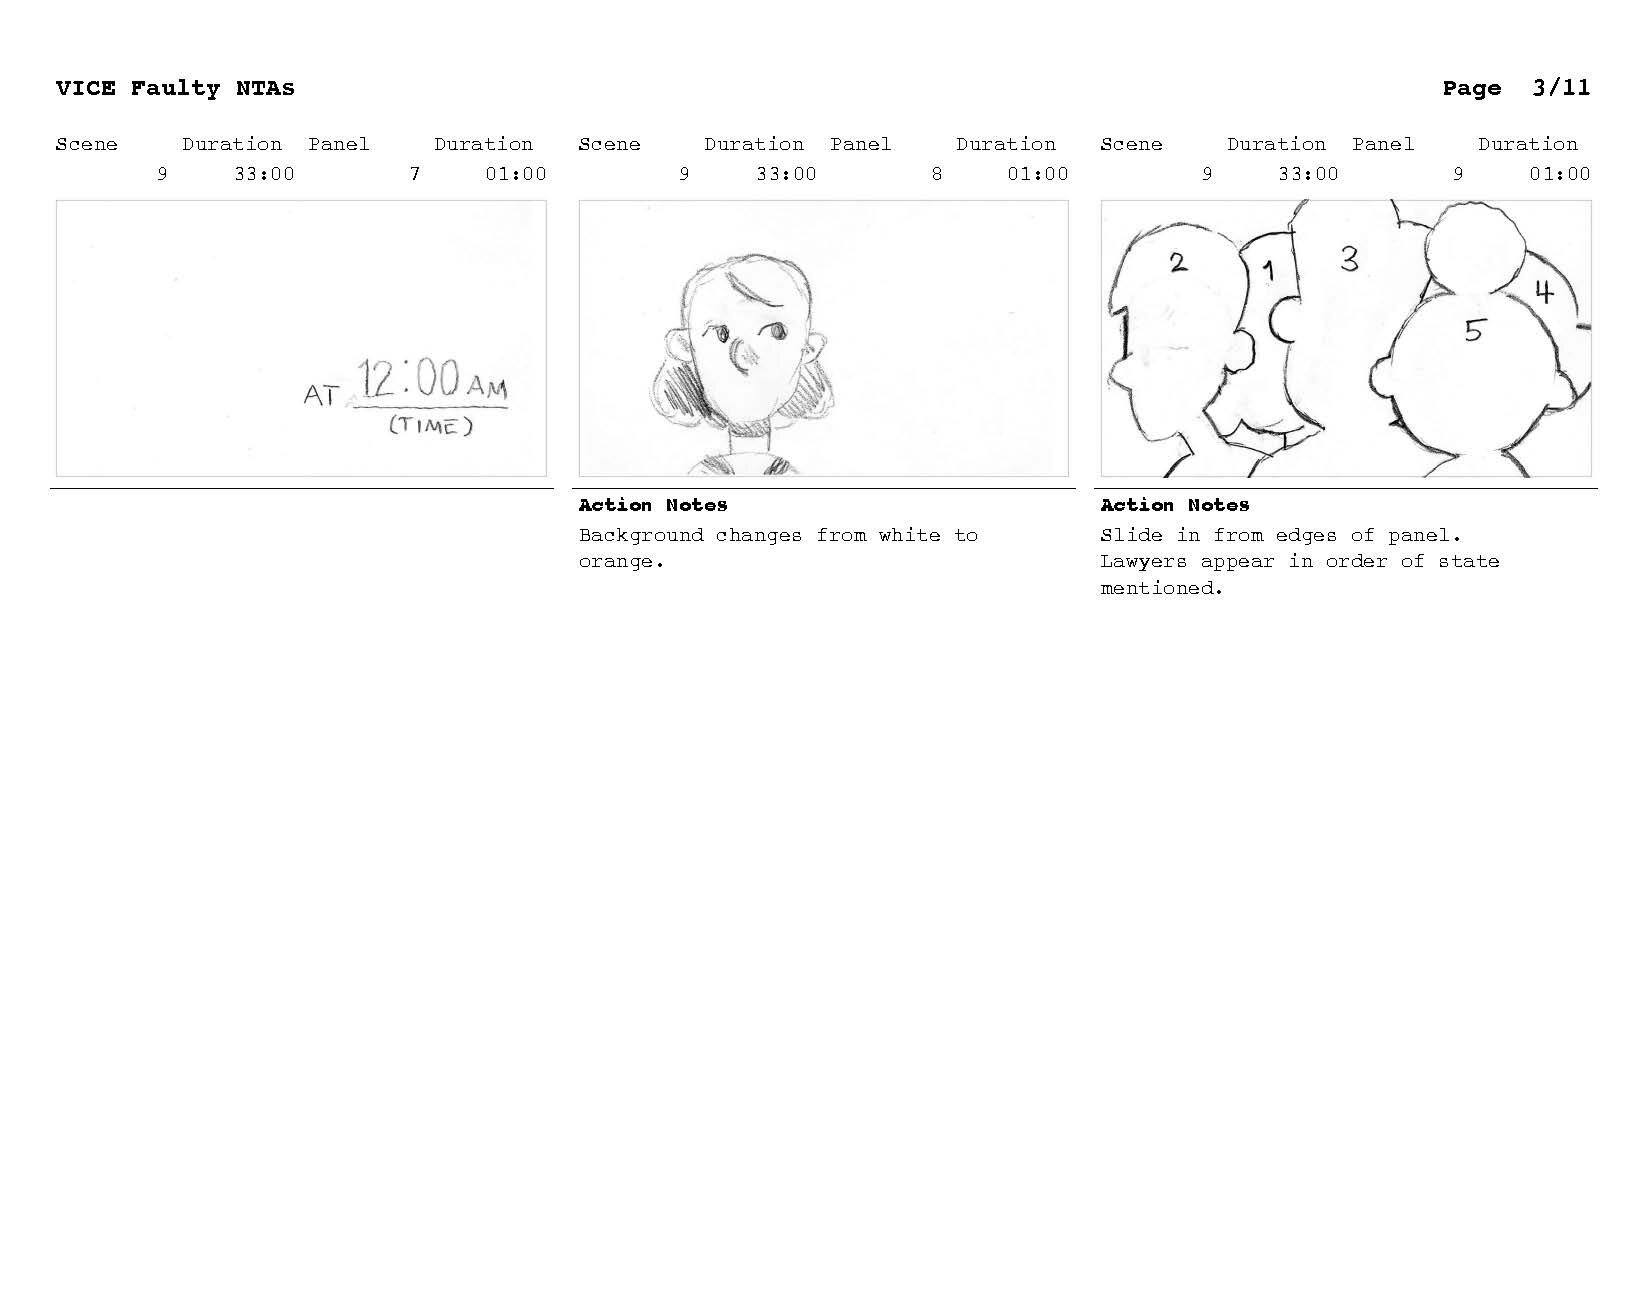 VICE News Tonight - Faulty NTAs storyboard_Page_03.jpg